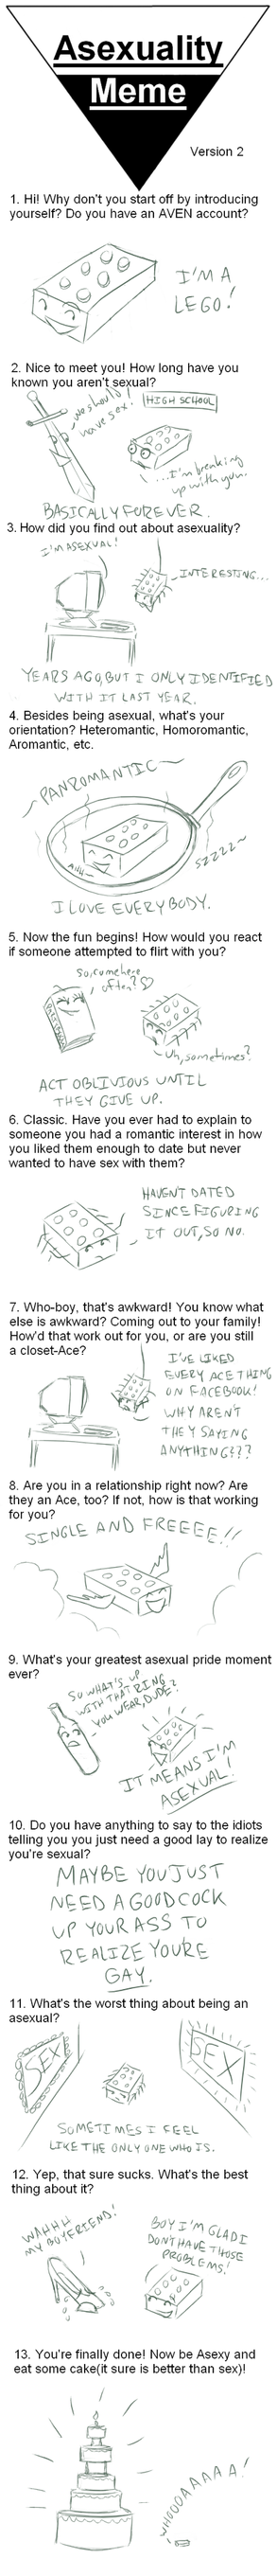 Asexy Meme by LegolianM